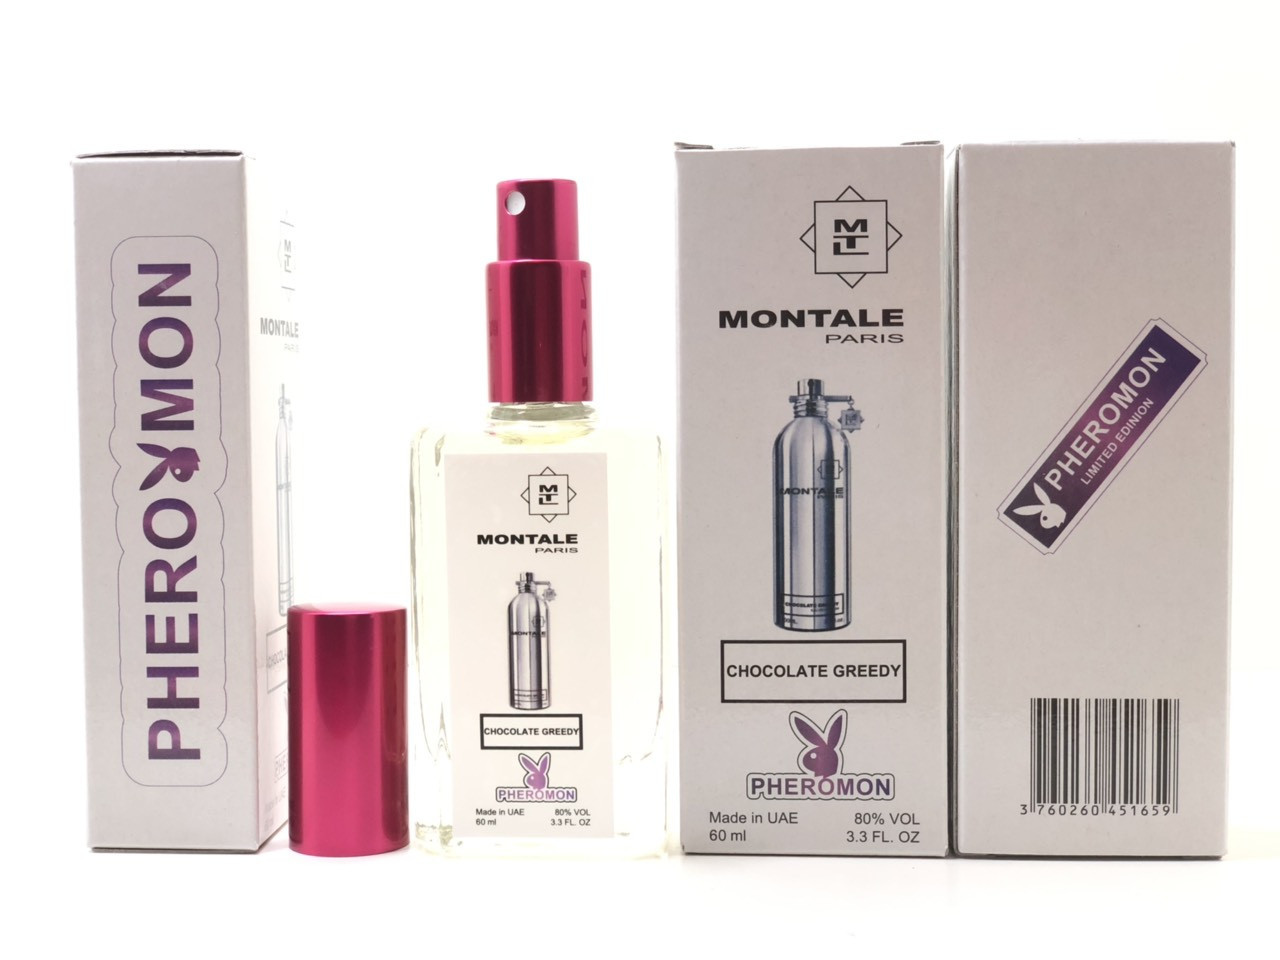 Montale Chocolate Greedy парфюмерия унисекс тестер 60 ml в цветной упаковке с феромонами (реплика)